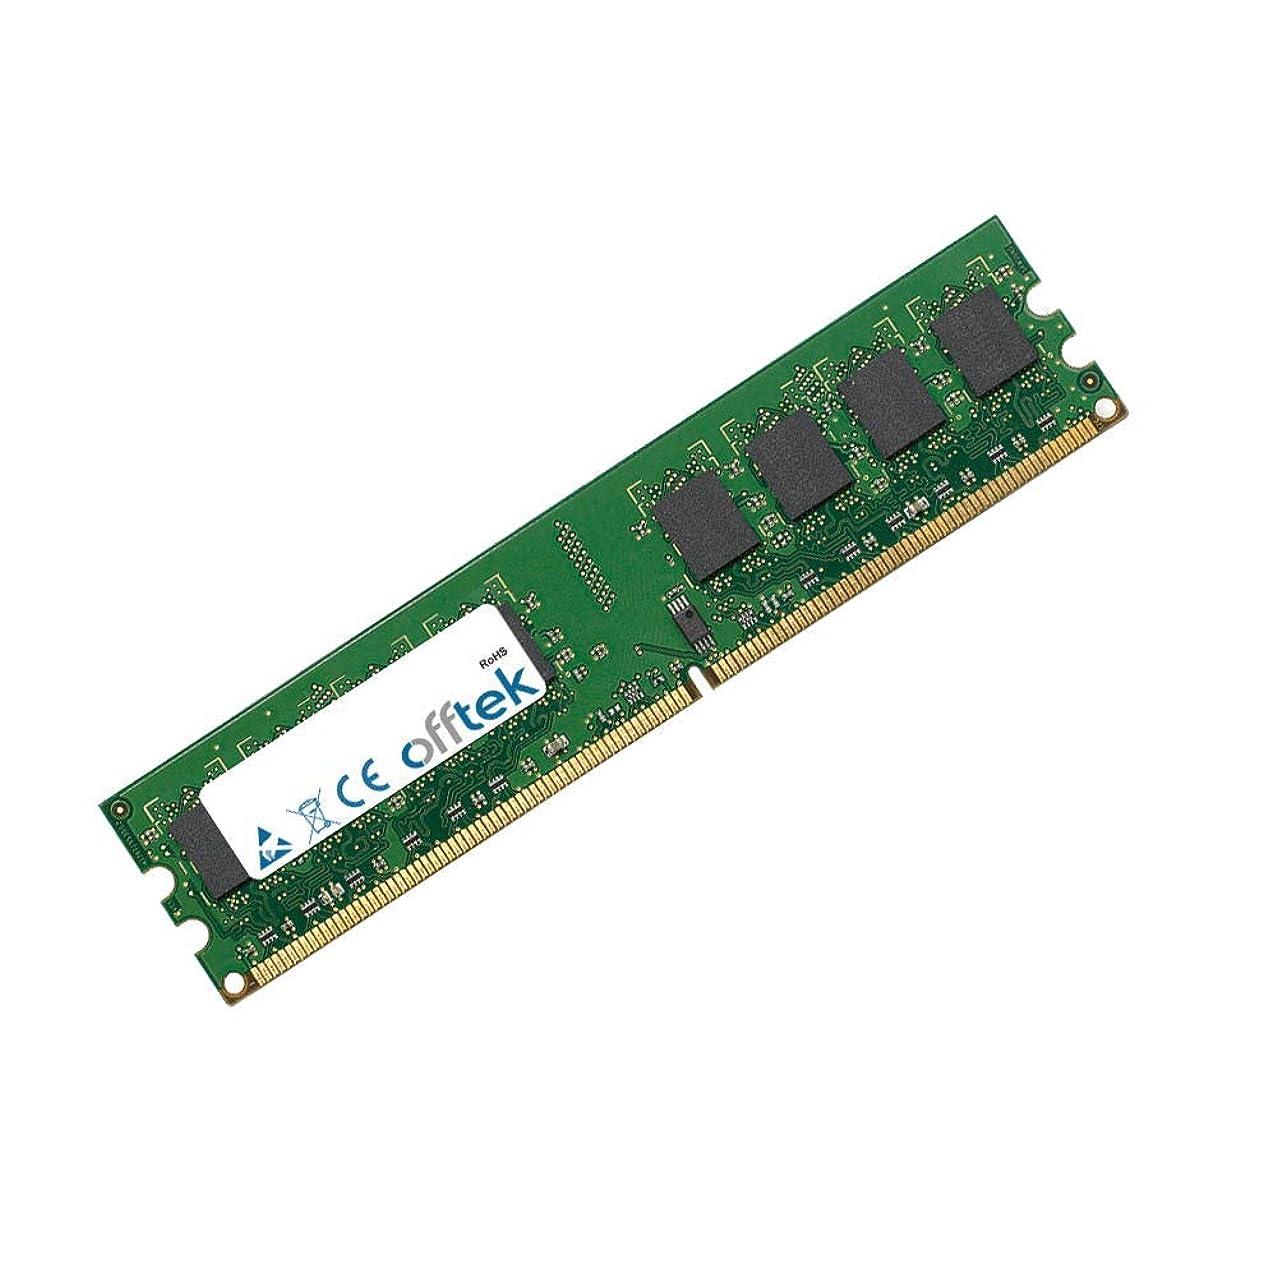 4GB RAM Memory for Asus P5G41C-M LX (DDR3-10600 - Non-ECC) - Motherboard Memory Upgrade